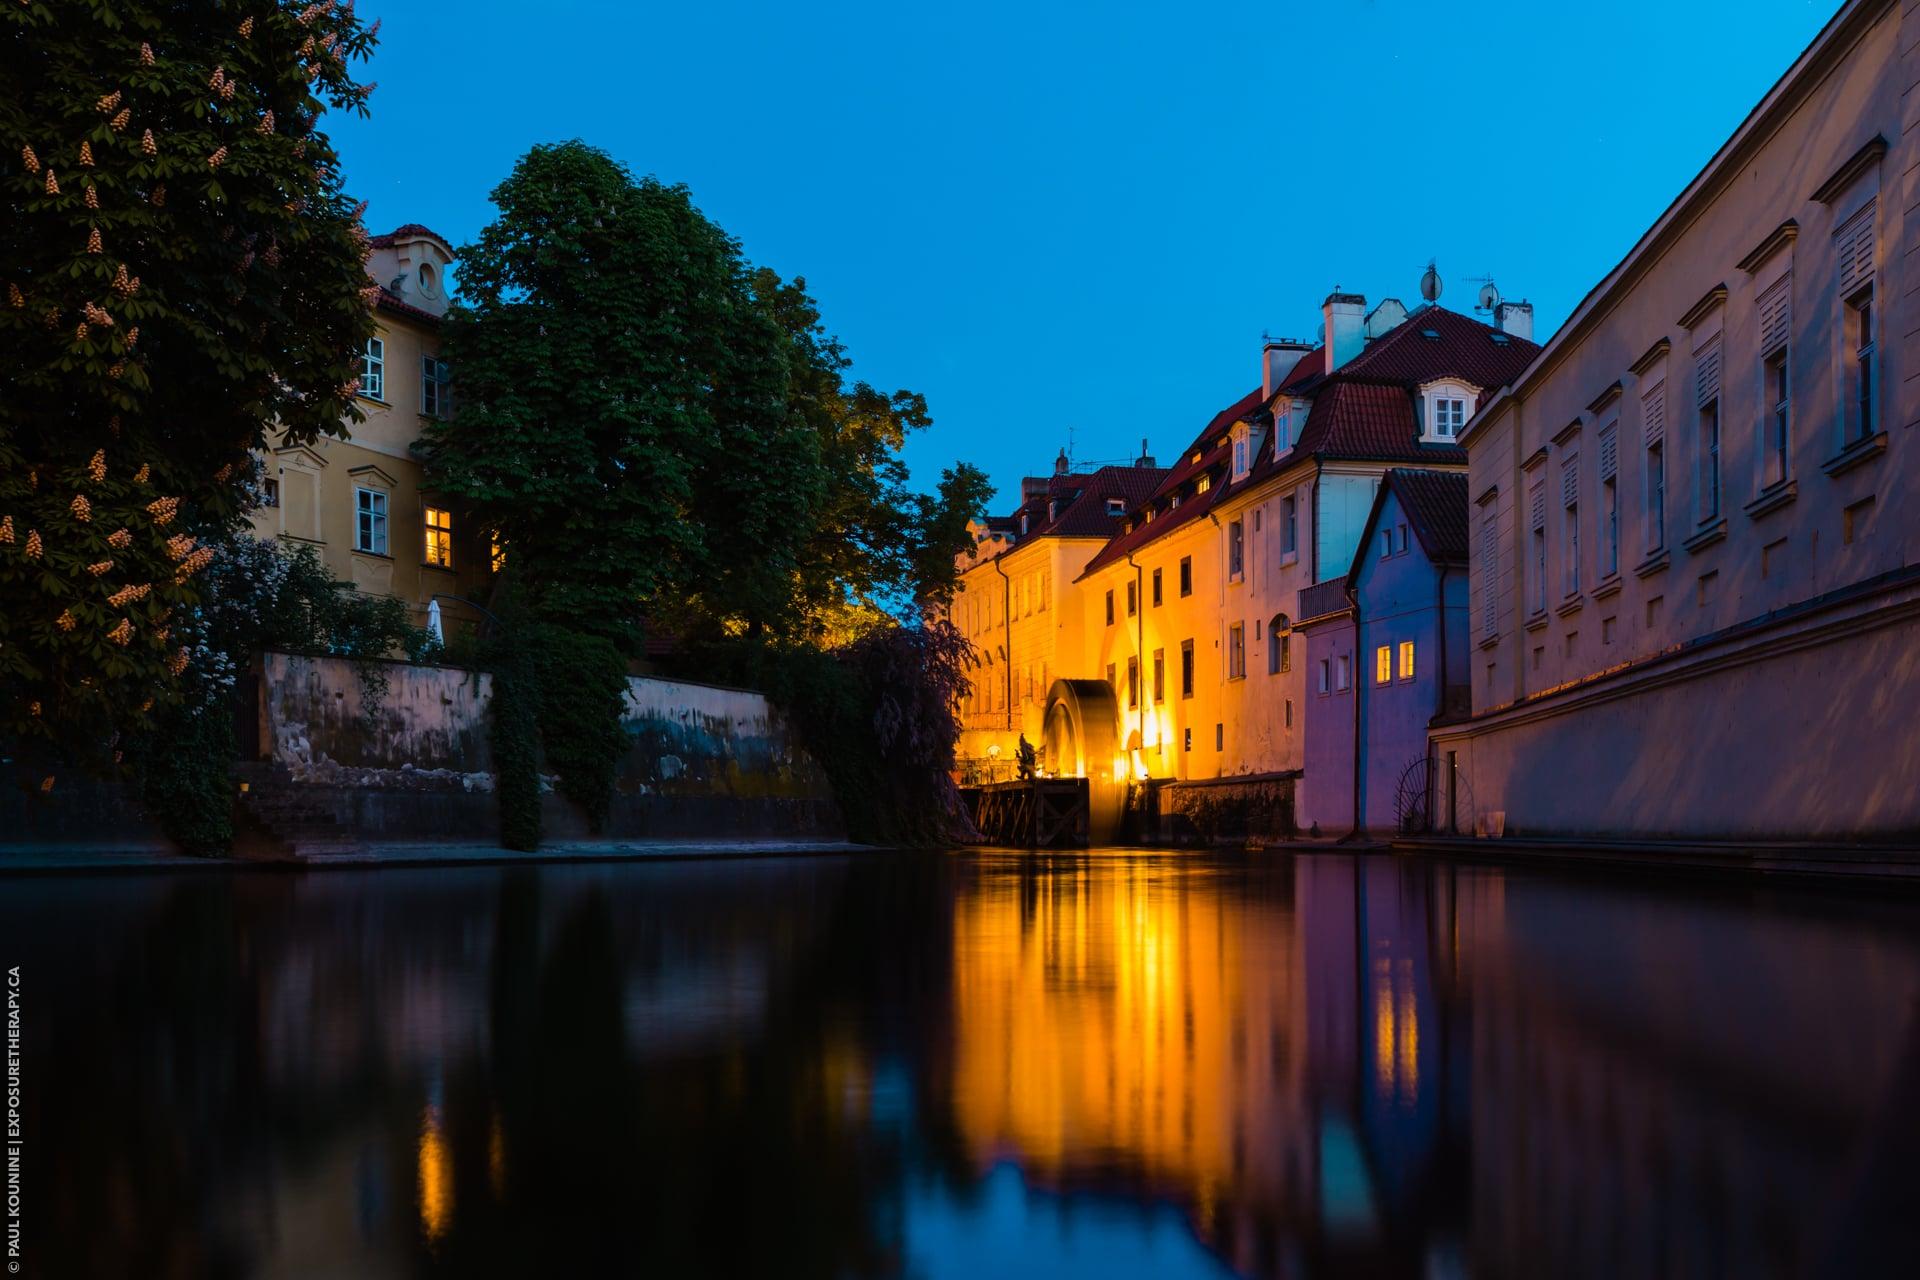 35 mm wide-angle lens on full-frame camera, Čertovka Canal, Prague.